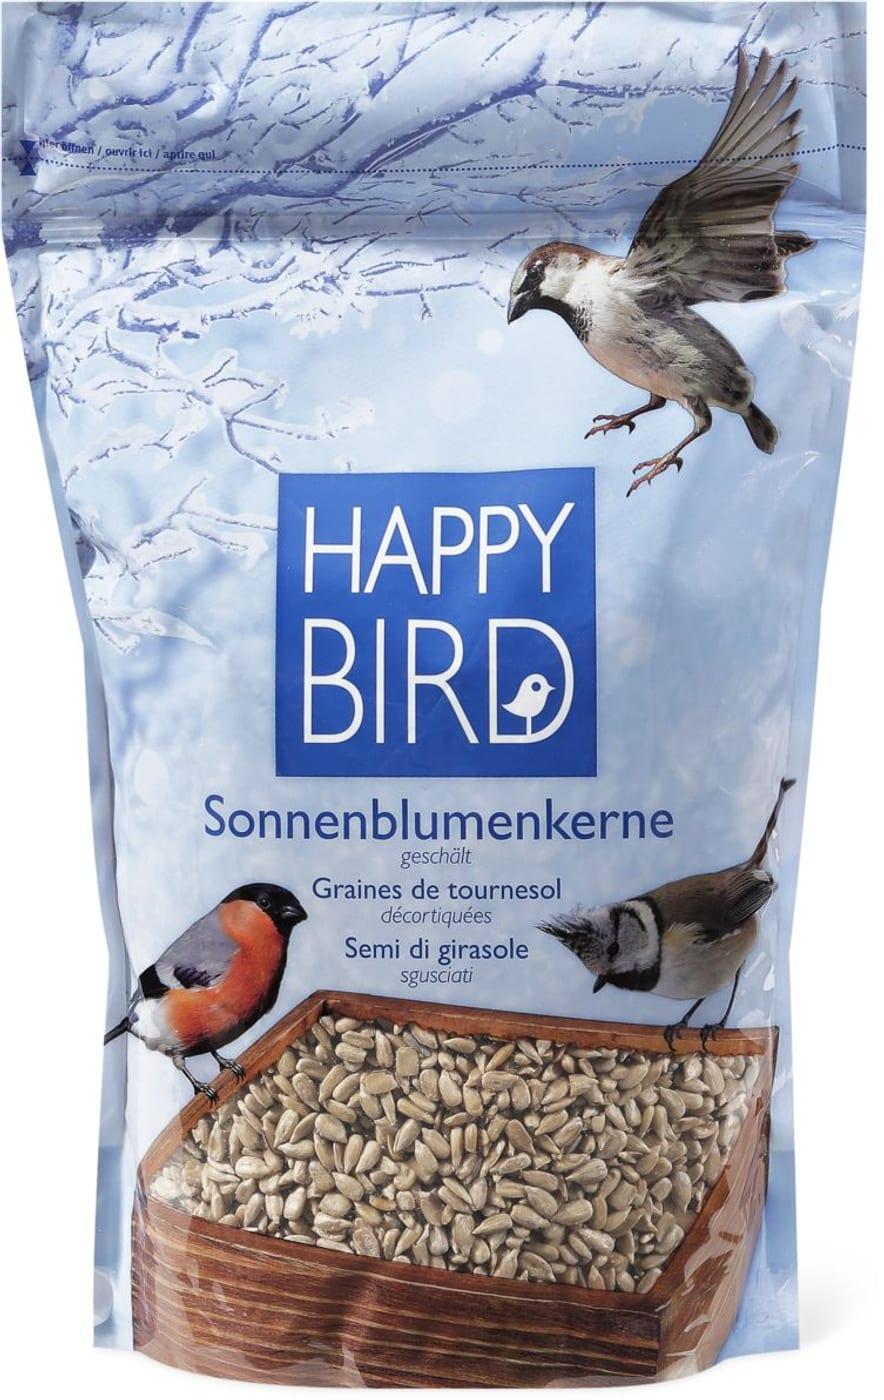 happy bird sonnenblumenkerne gesch lt migros. Black Bedroom Furniture Sets. Home Design Ideas